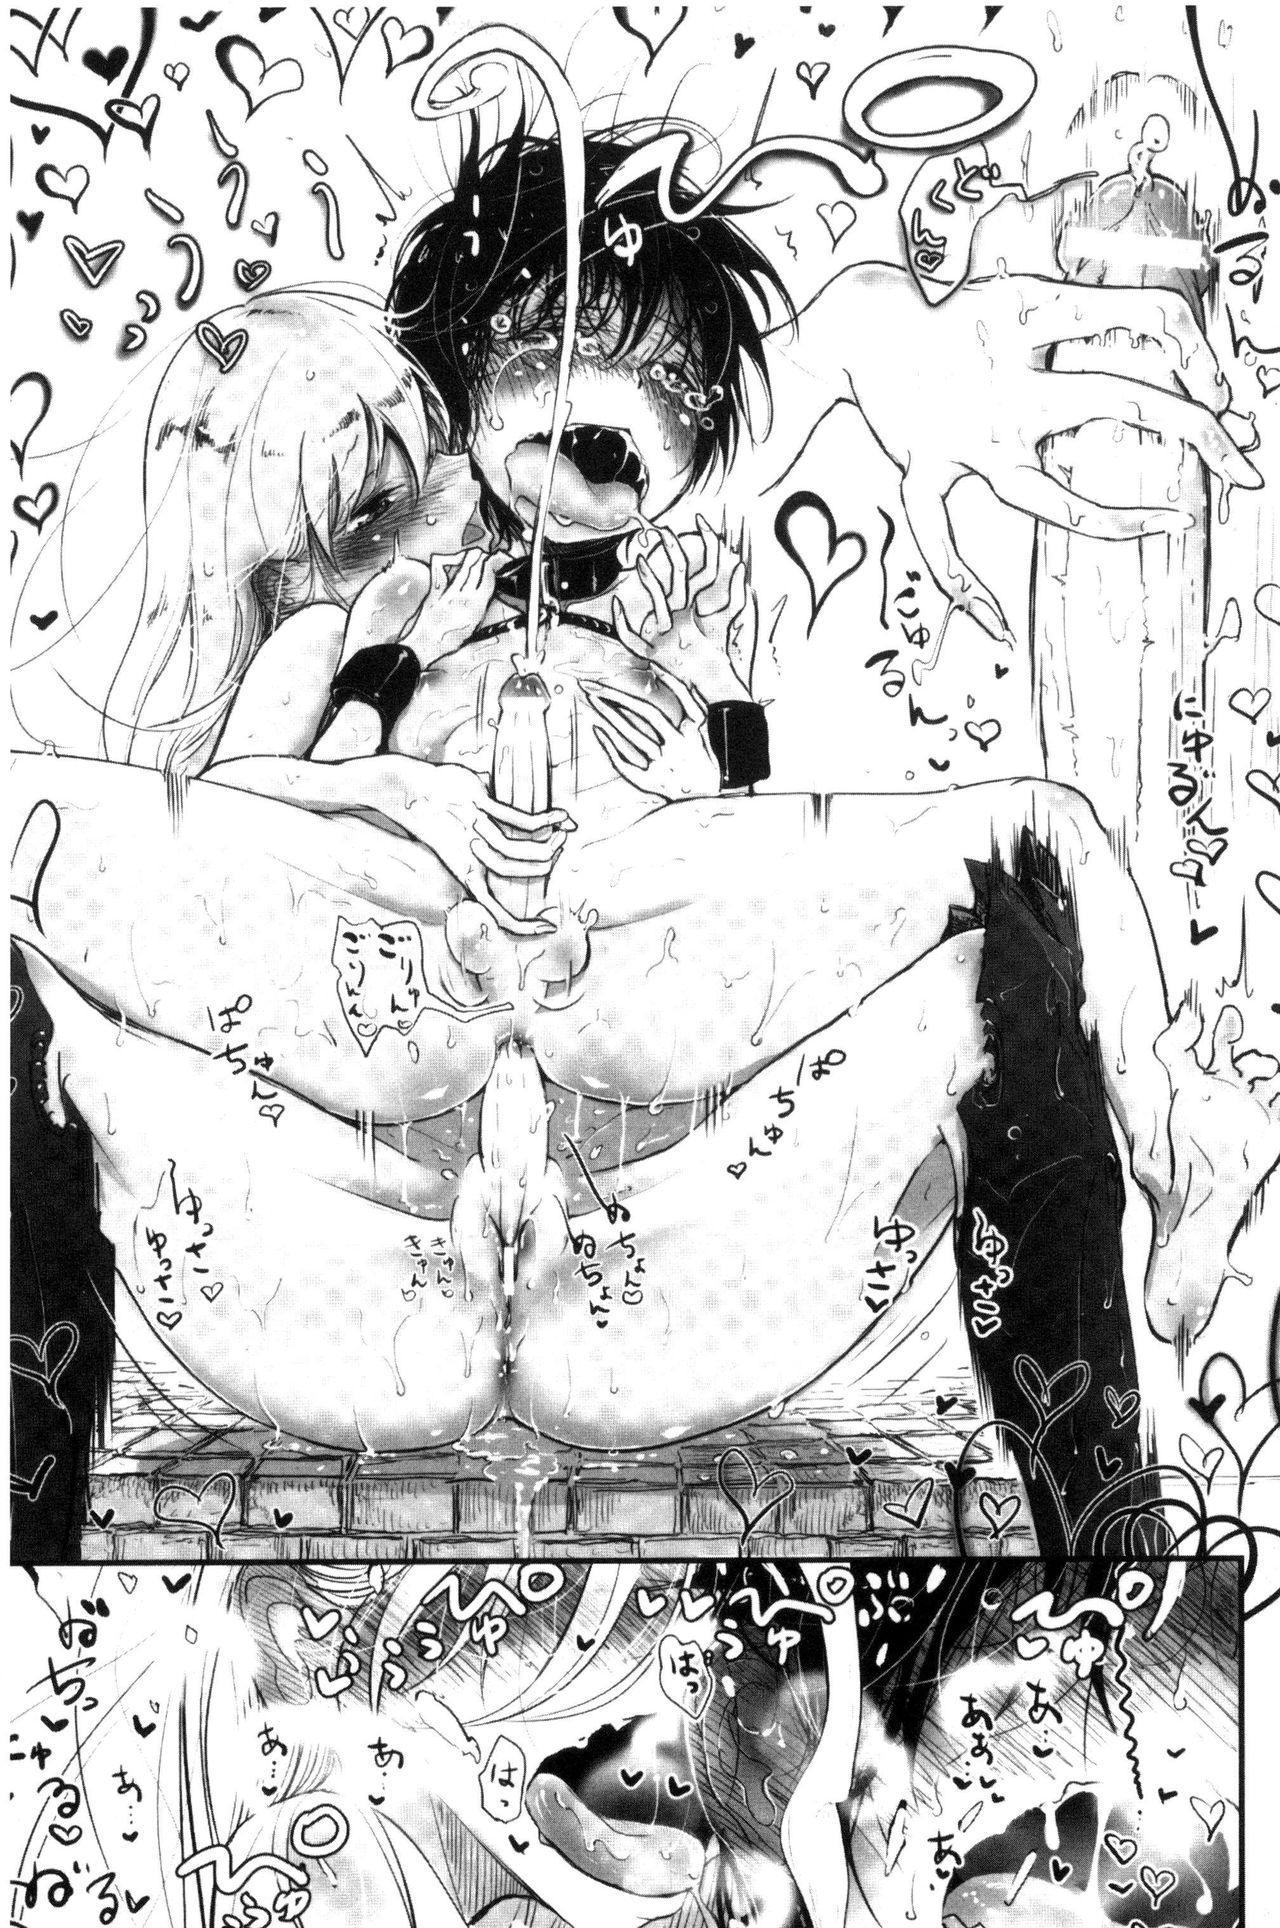 [Dhibi] Sono Yubisaki de Korogashite - Please Caress it at the Finger-tip. [Chinese] 108